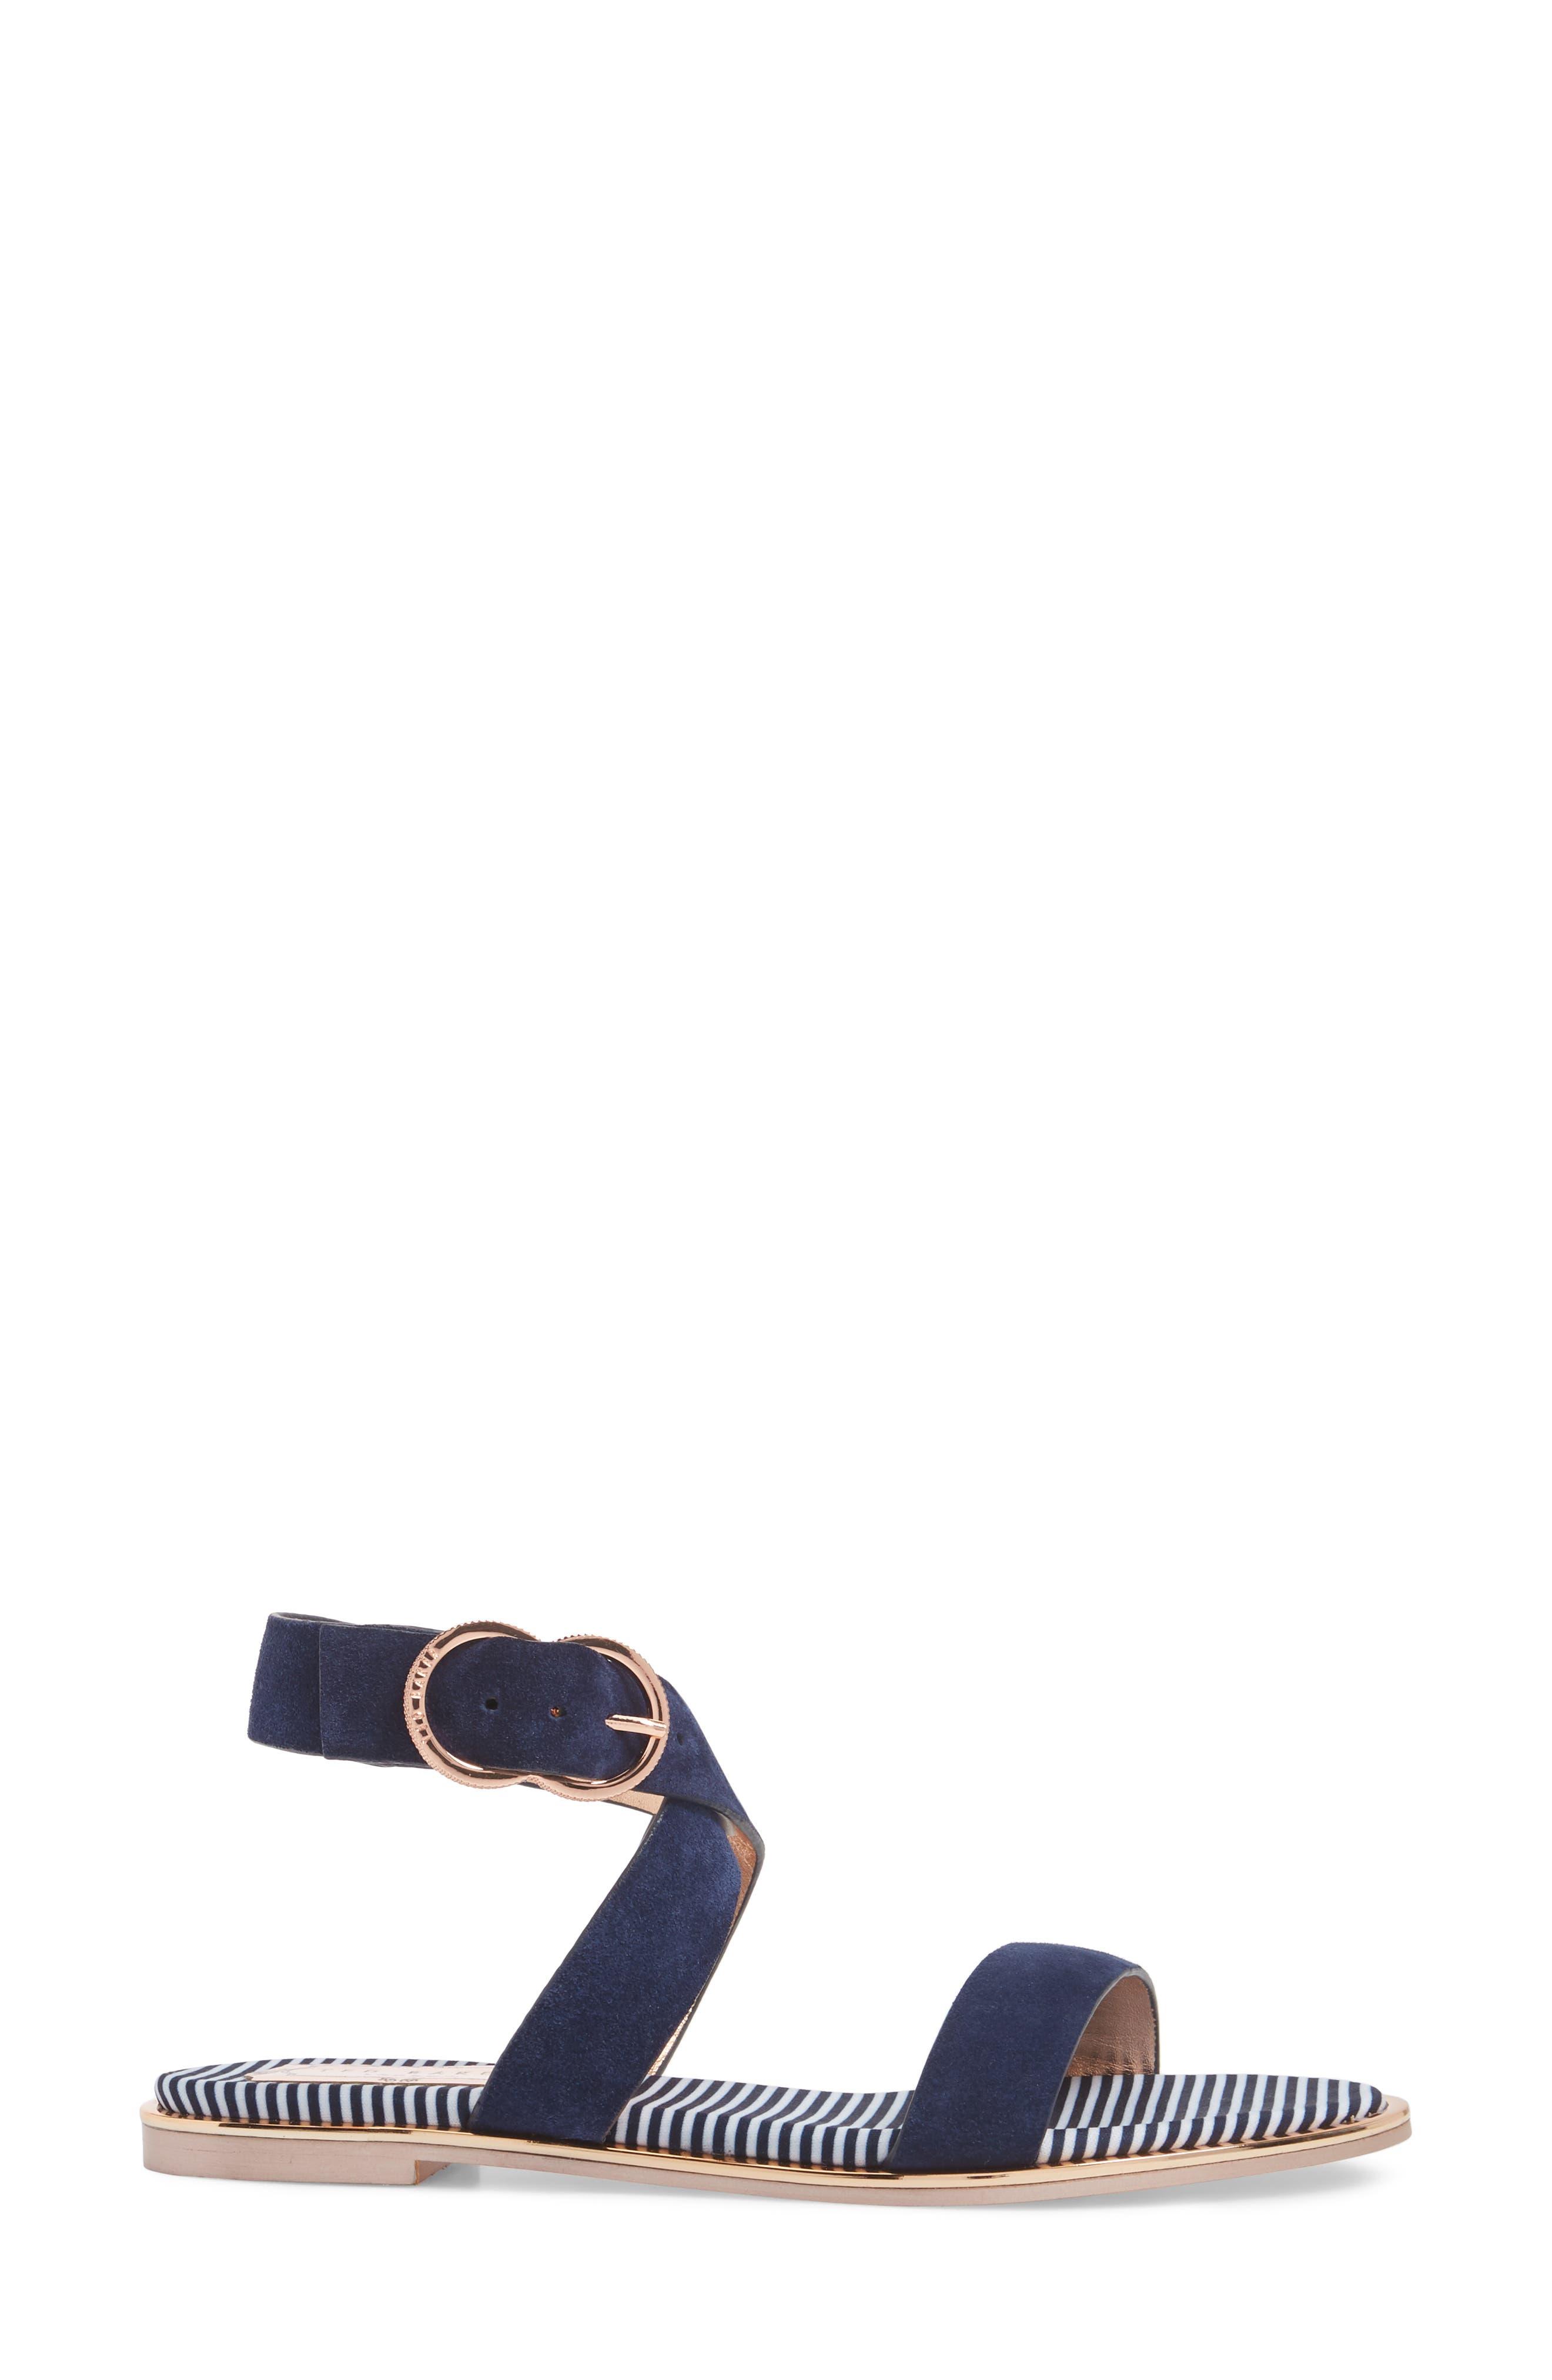 Qeredas Sandal,                             Alternate thumbnail 3, color,                             Navy Suede